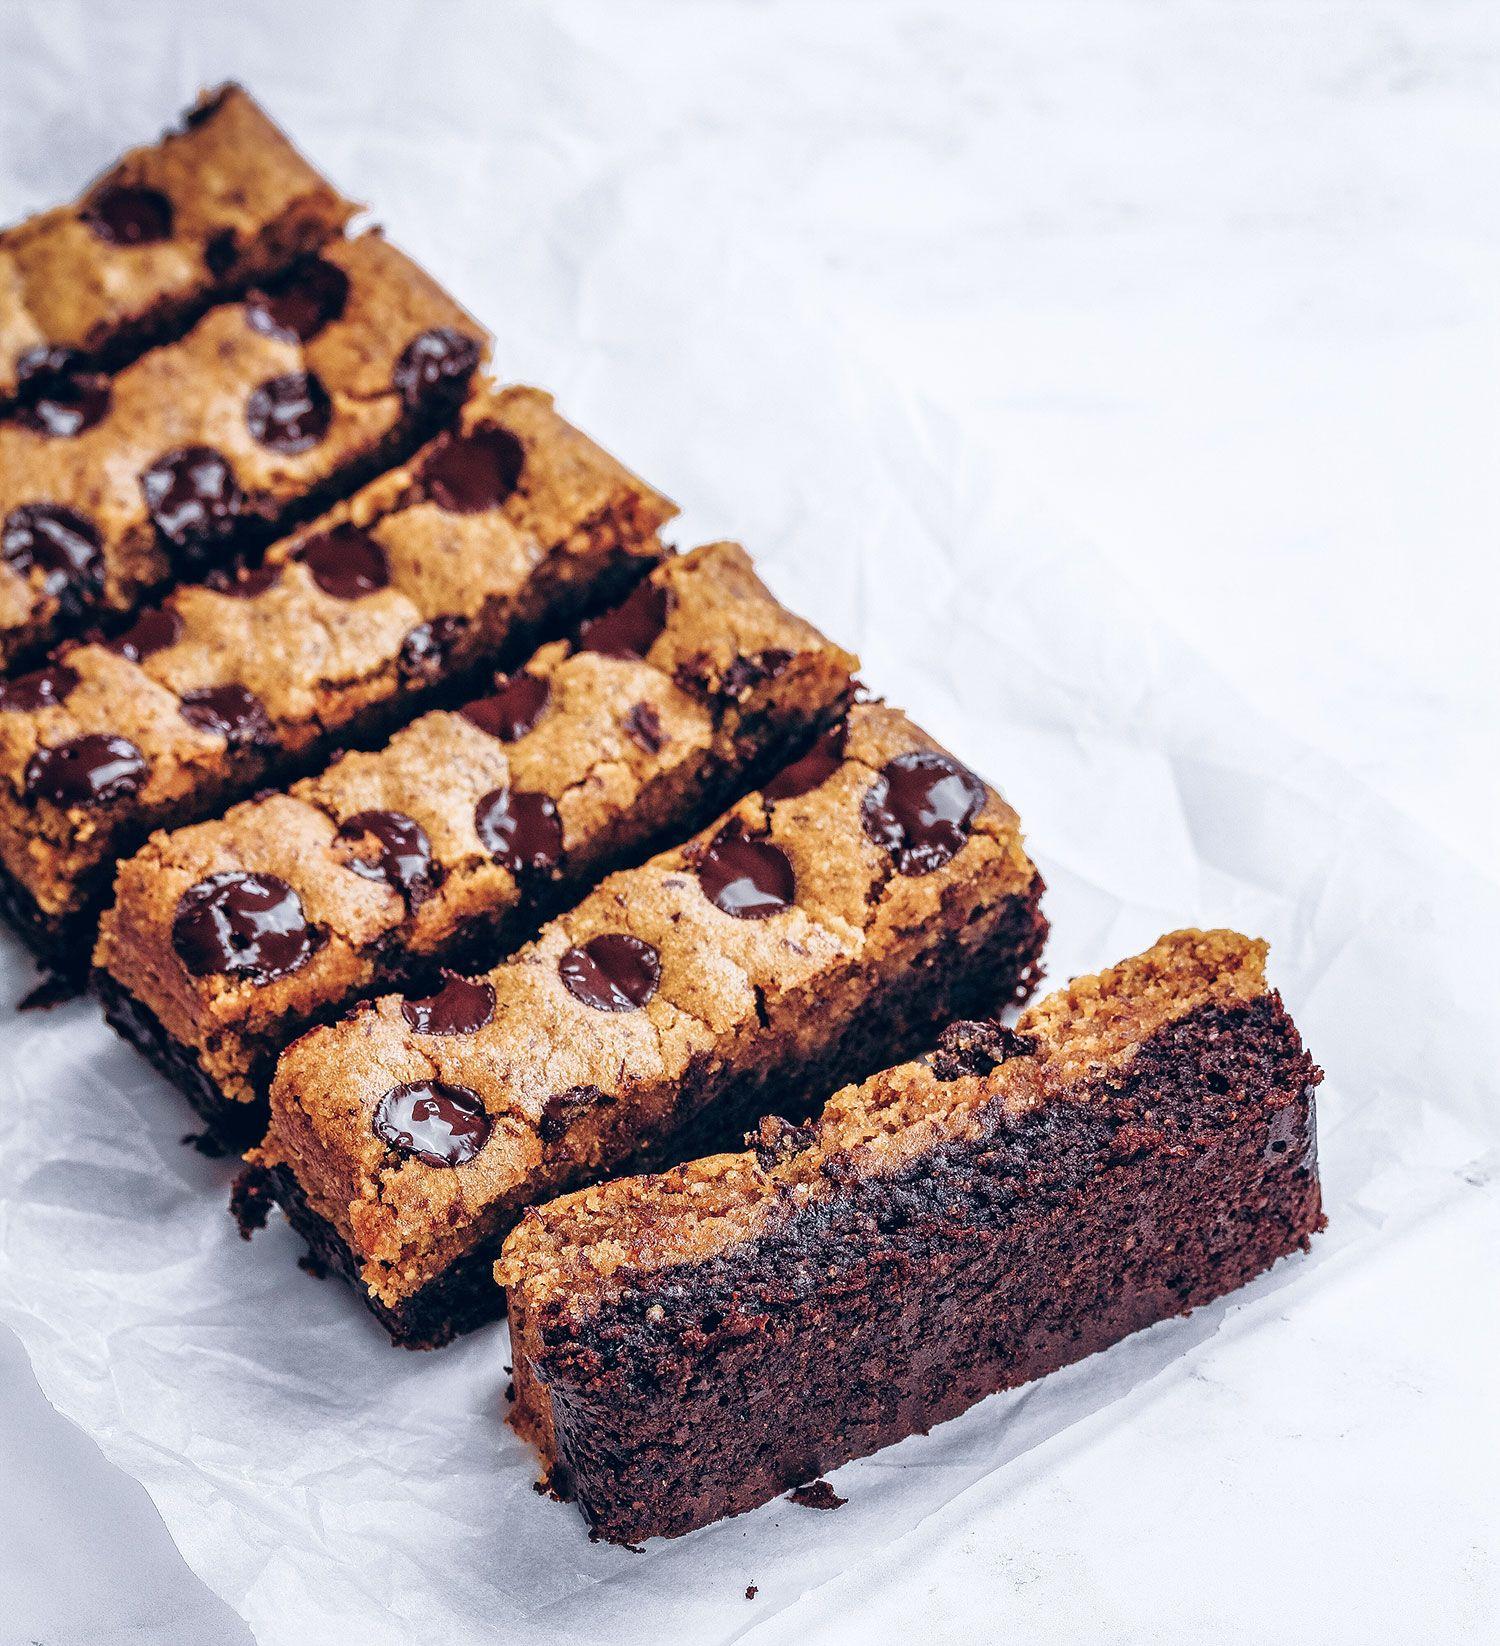 Cookie Dough Brownie Bars #healthycookiedough